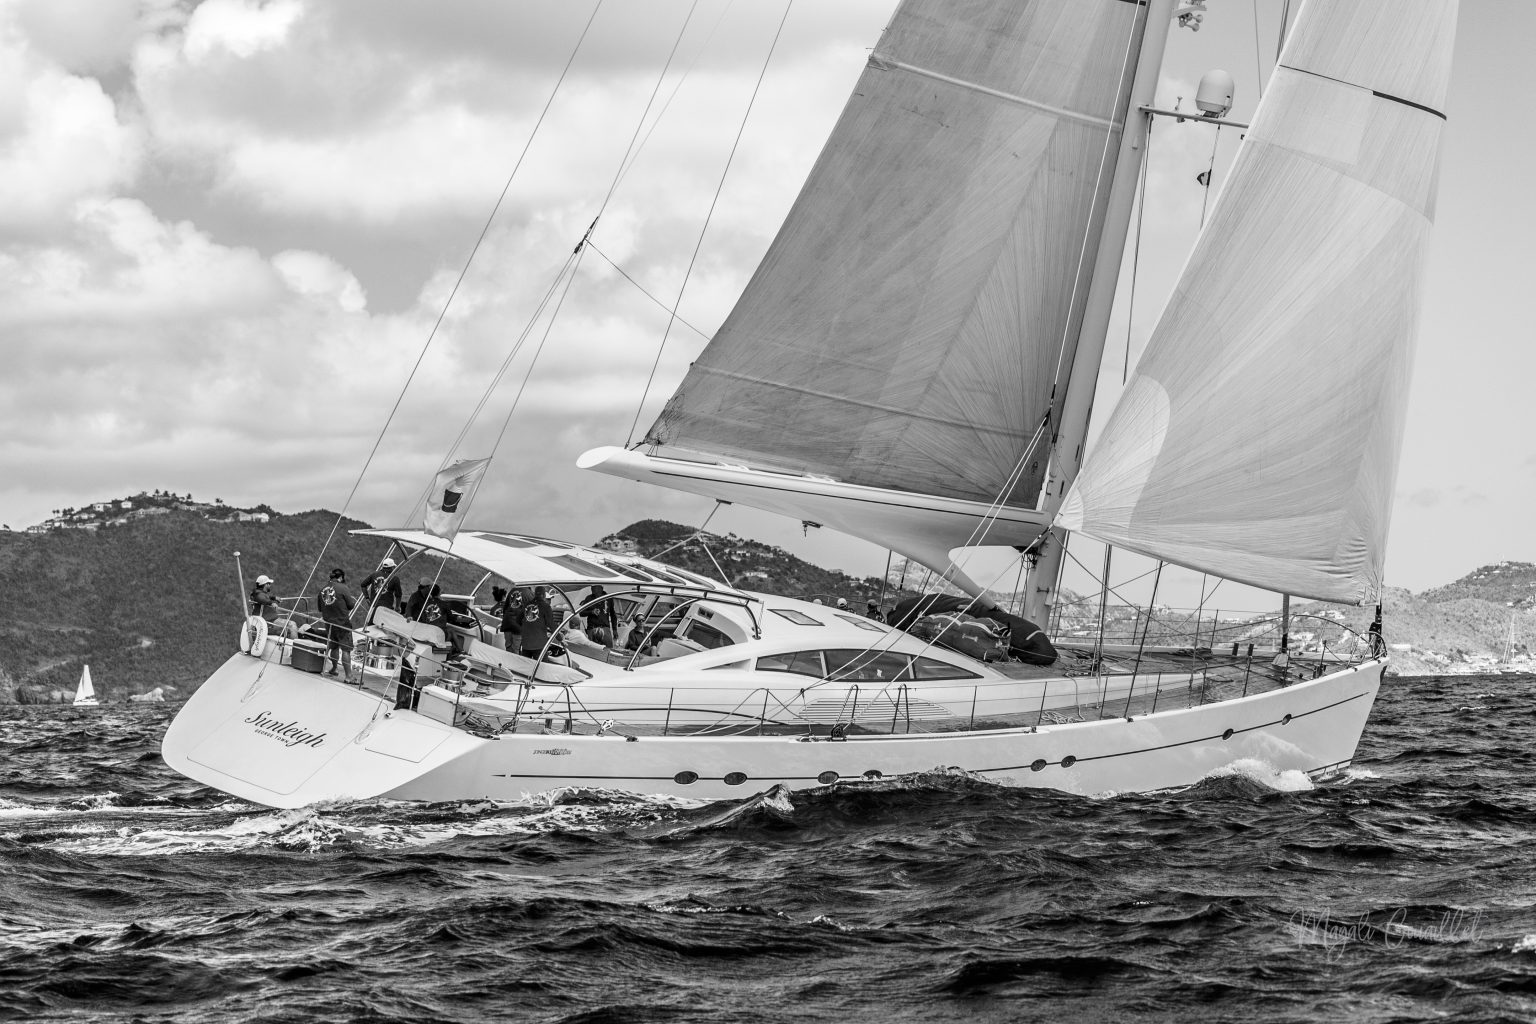 Sunleigh Yacht, Bucket Regatta 2019 St Barths